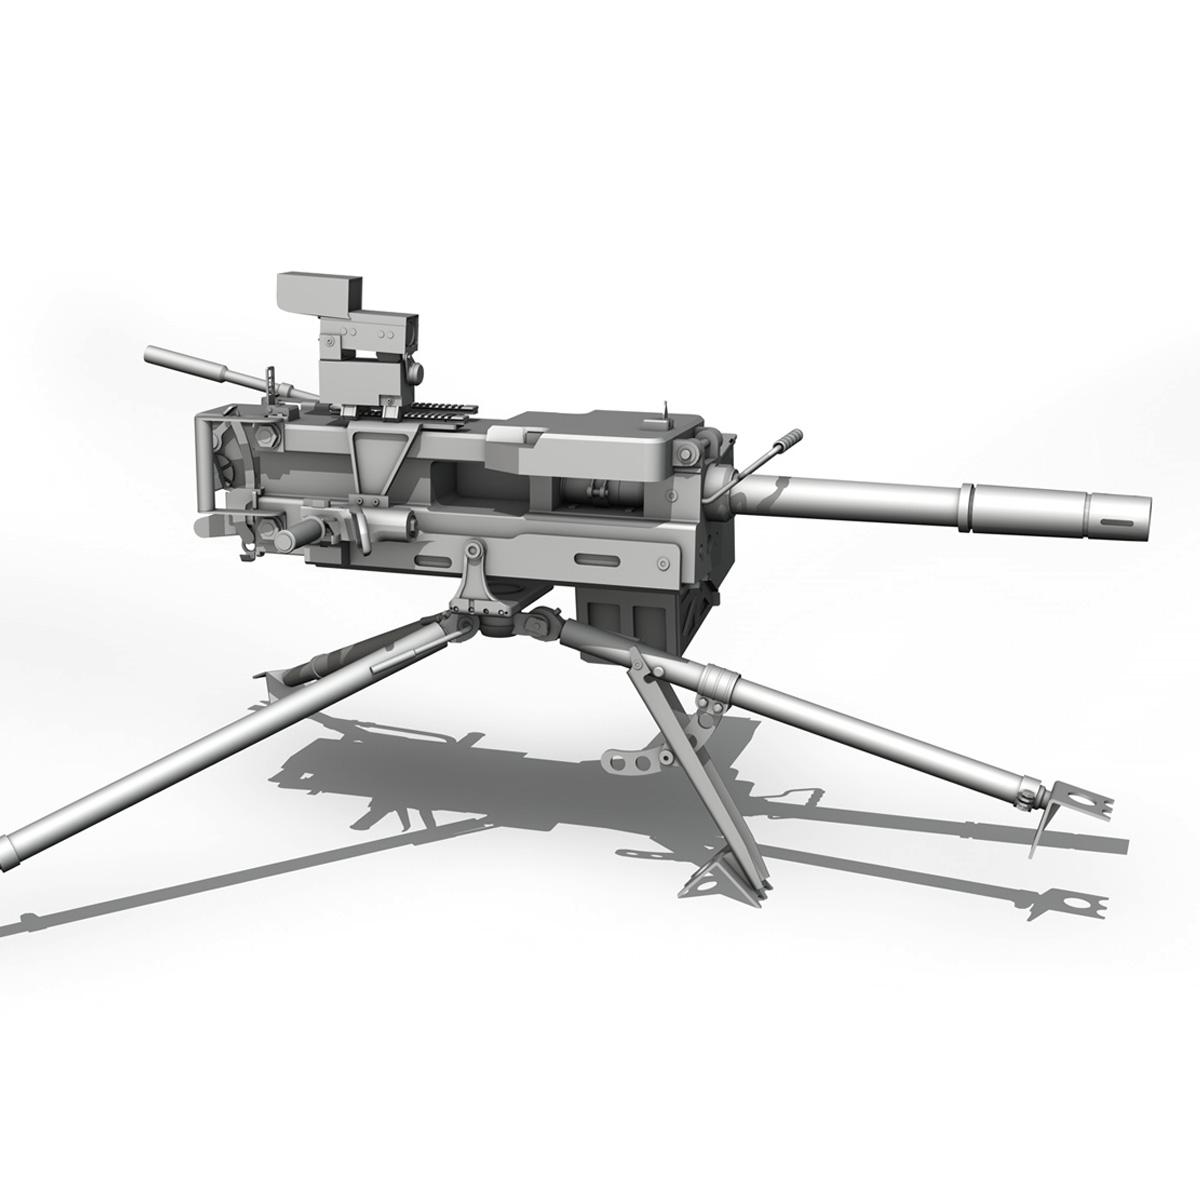 40mm qumbara pulemyotu gmg 3d model c4d lwo 3dm obj 264301